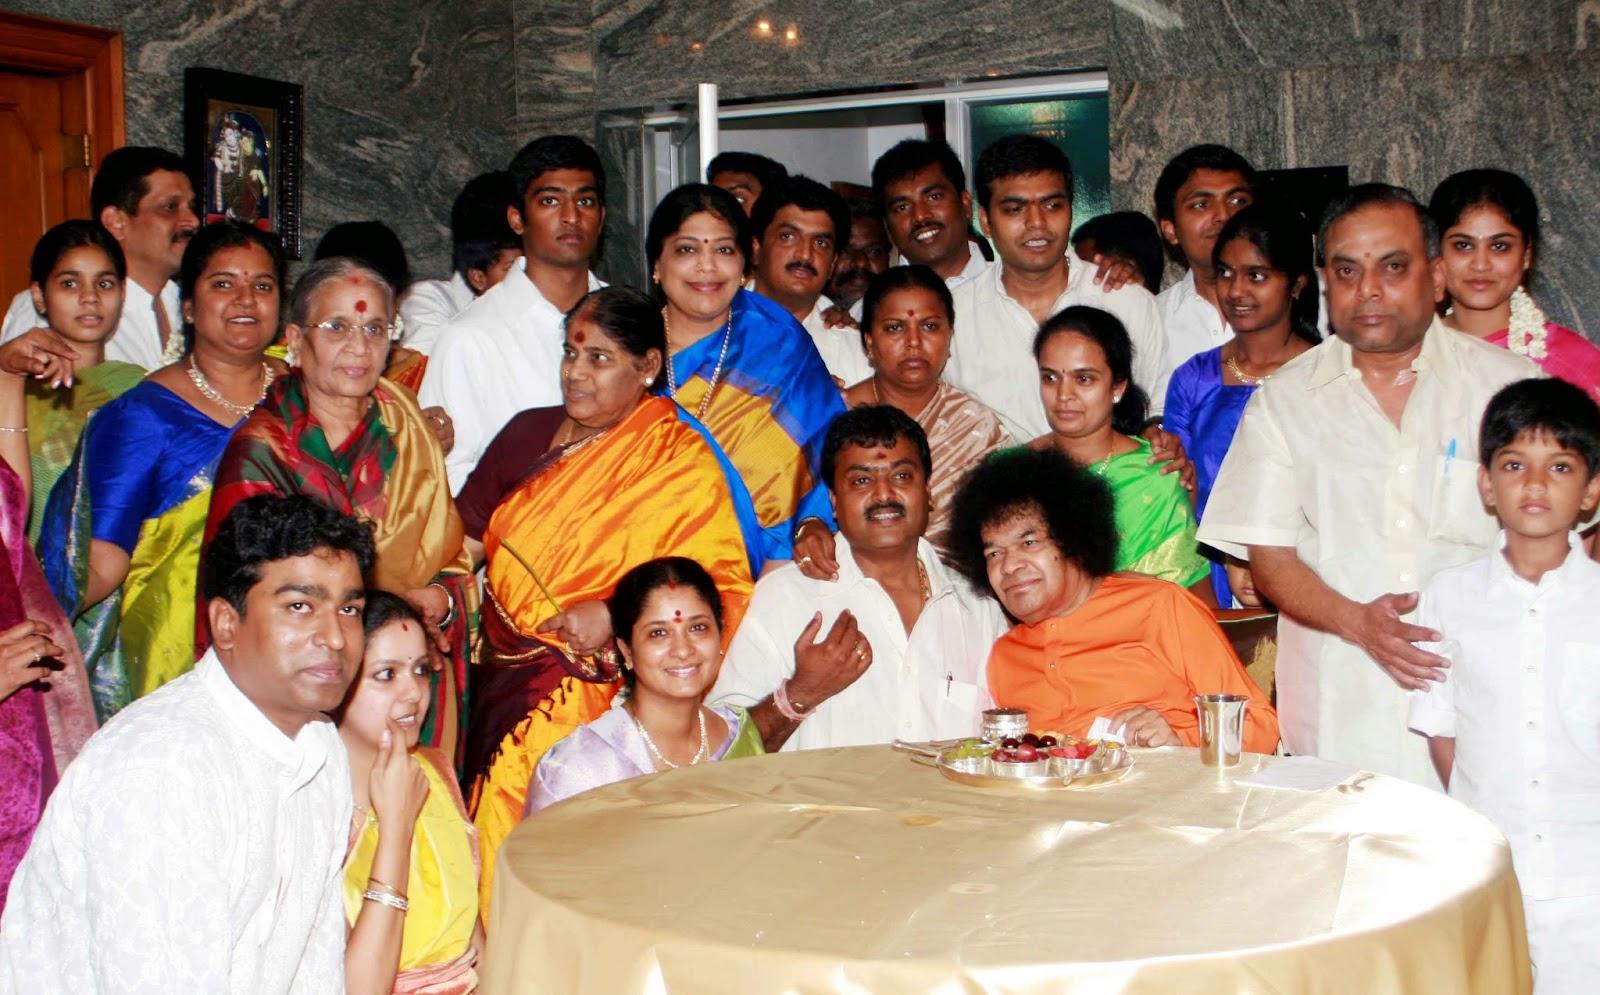 Part 1 bhagavan tamil romantic movie - 1 8